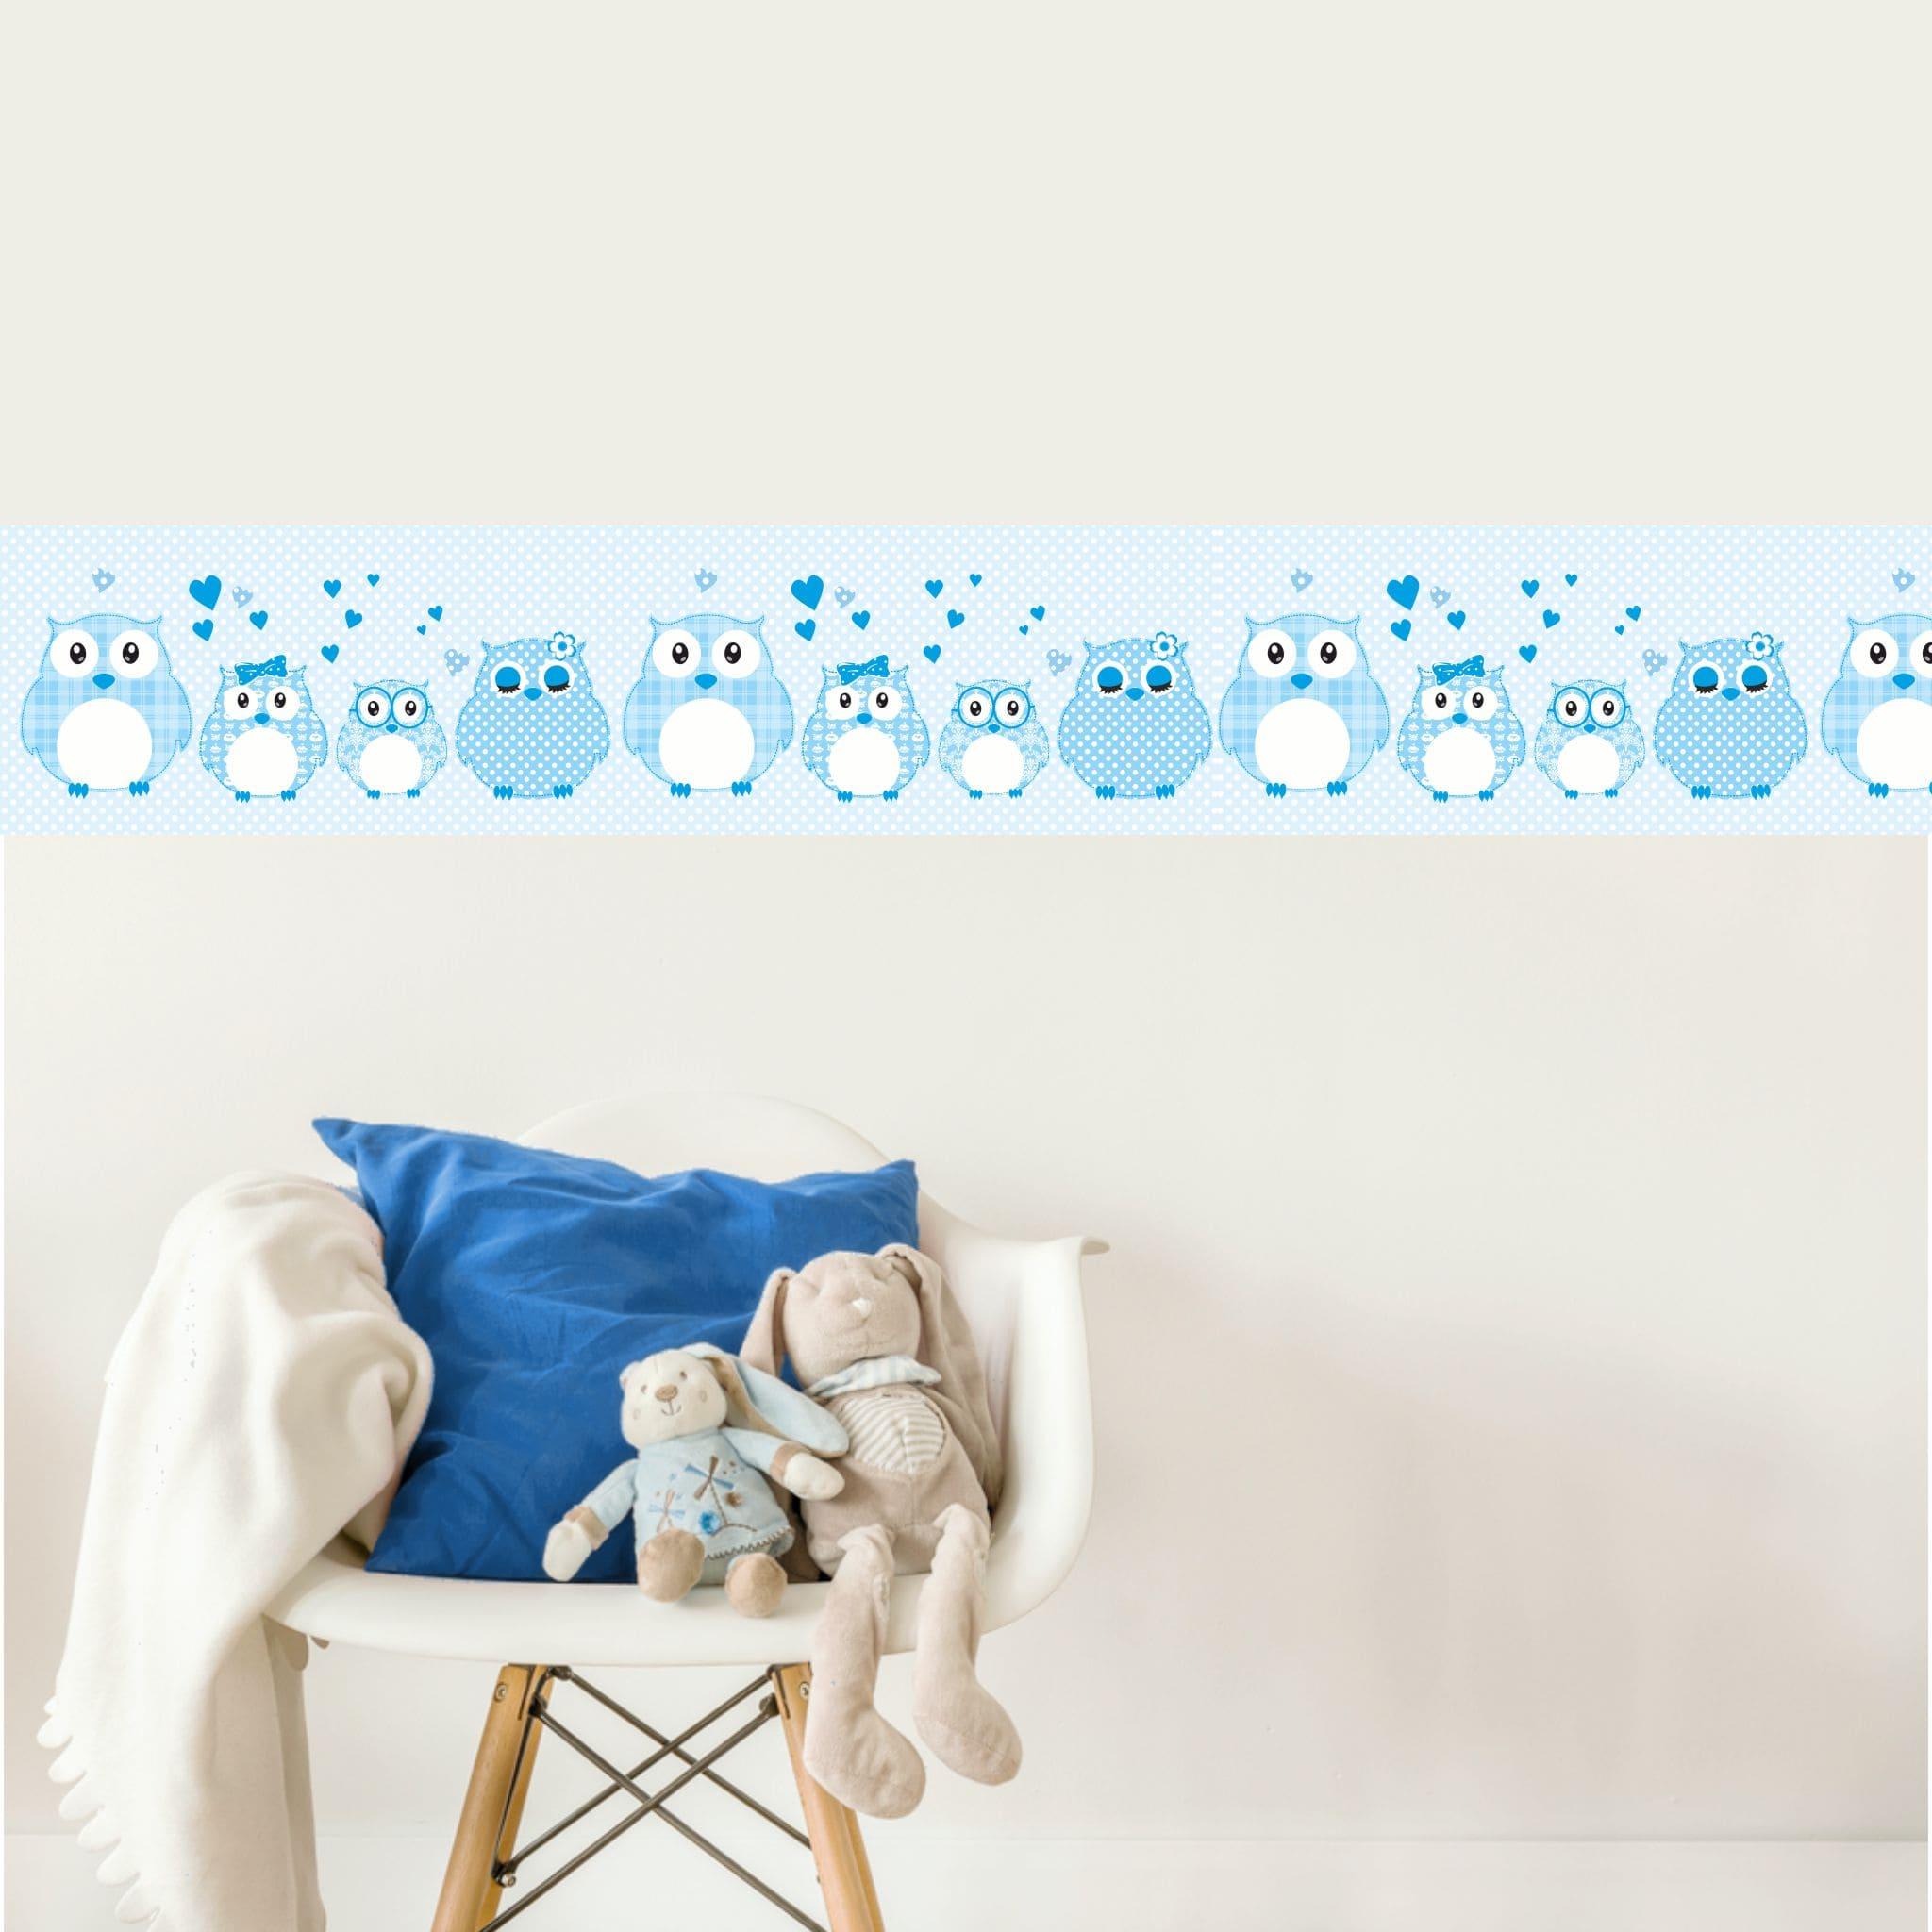 Full Size of Vlies Bordre Selbstklebend Frs Kinderzimmer Patchwork Blau Regal Regale Weiß Sofa Kinderzimmer Bordüren Kinderzimmer